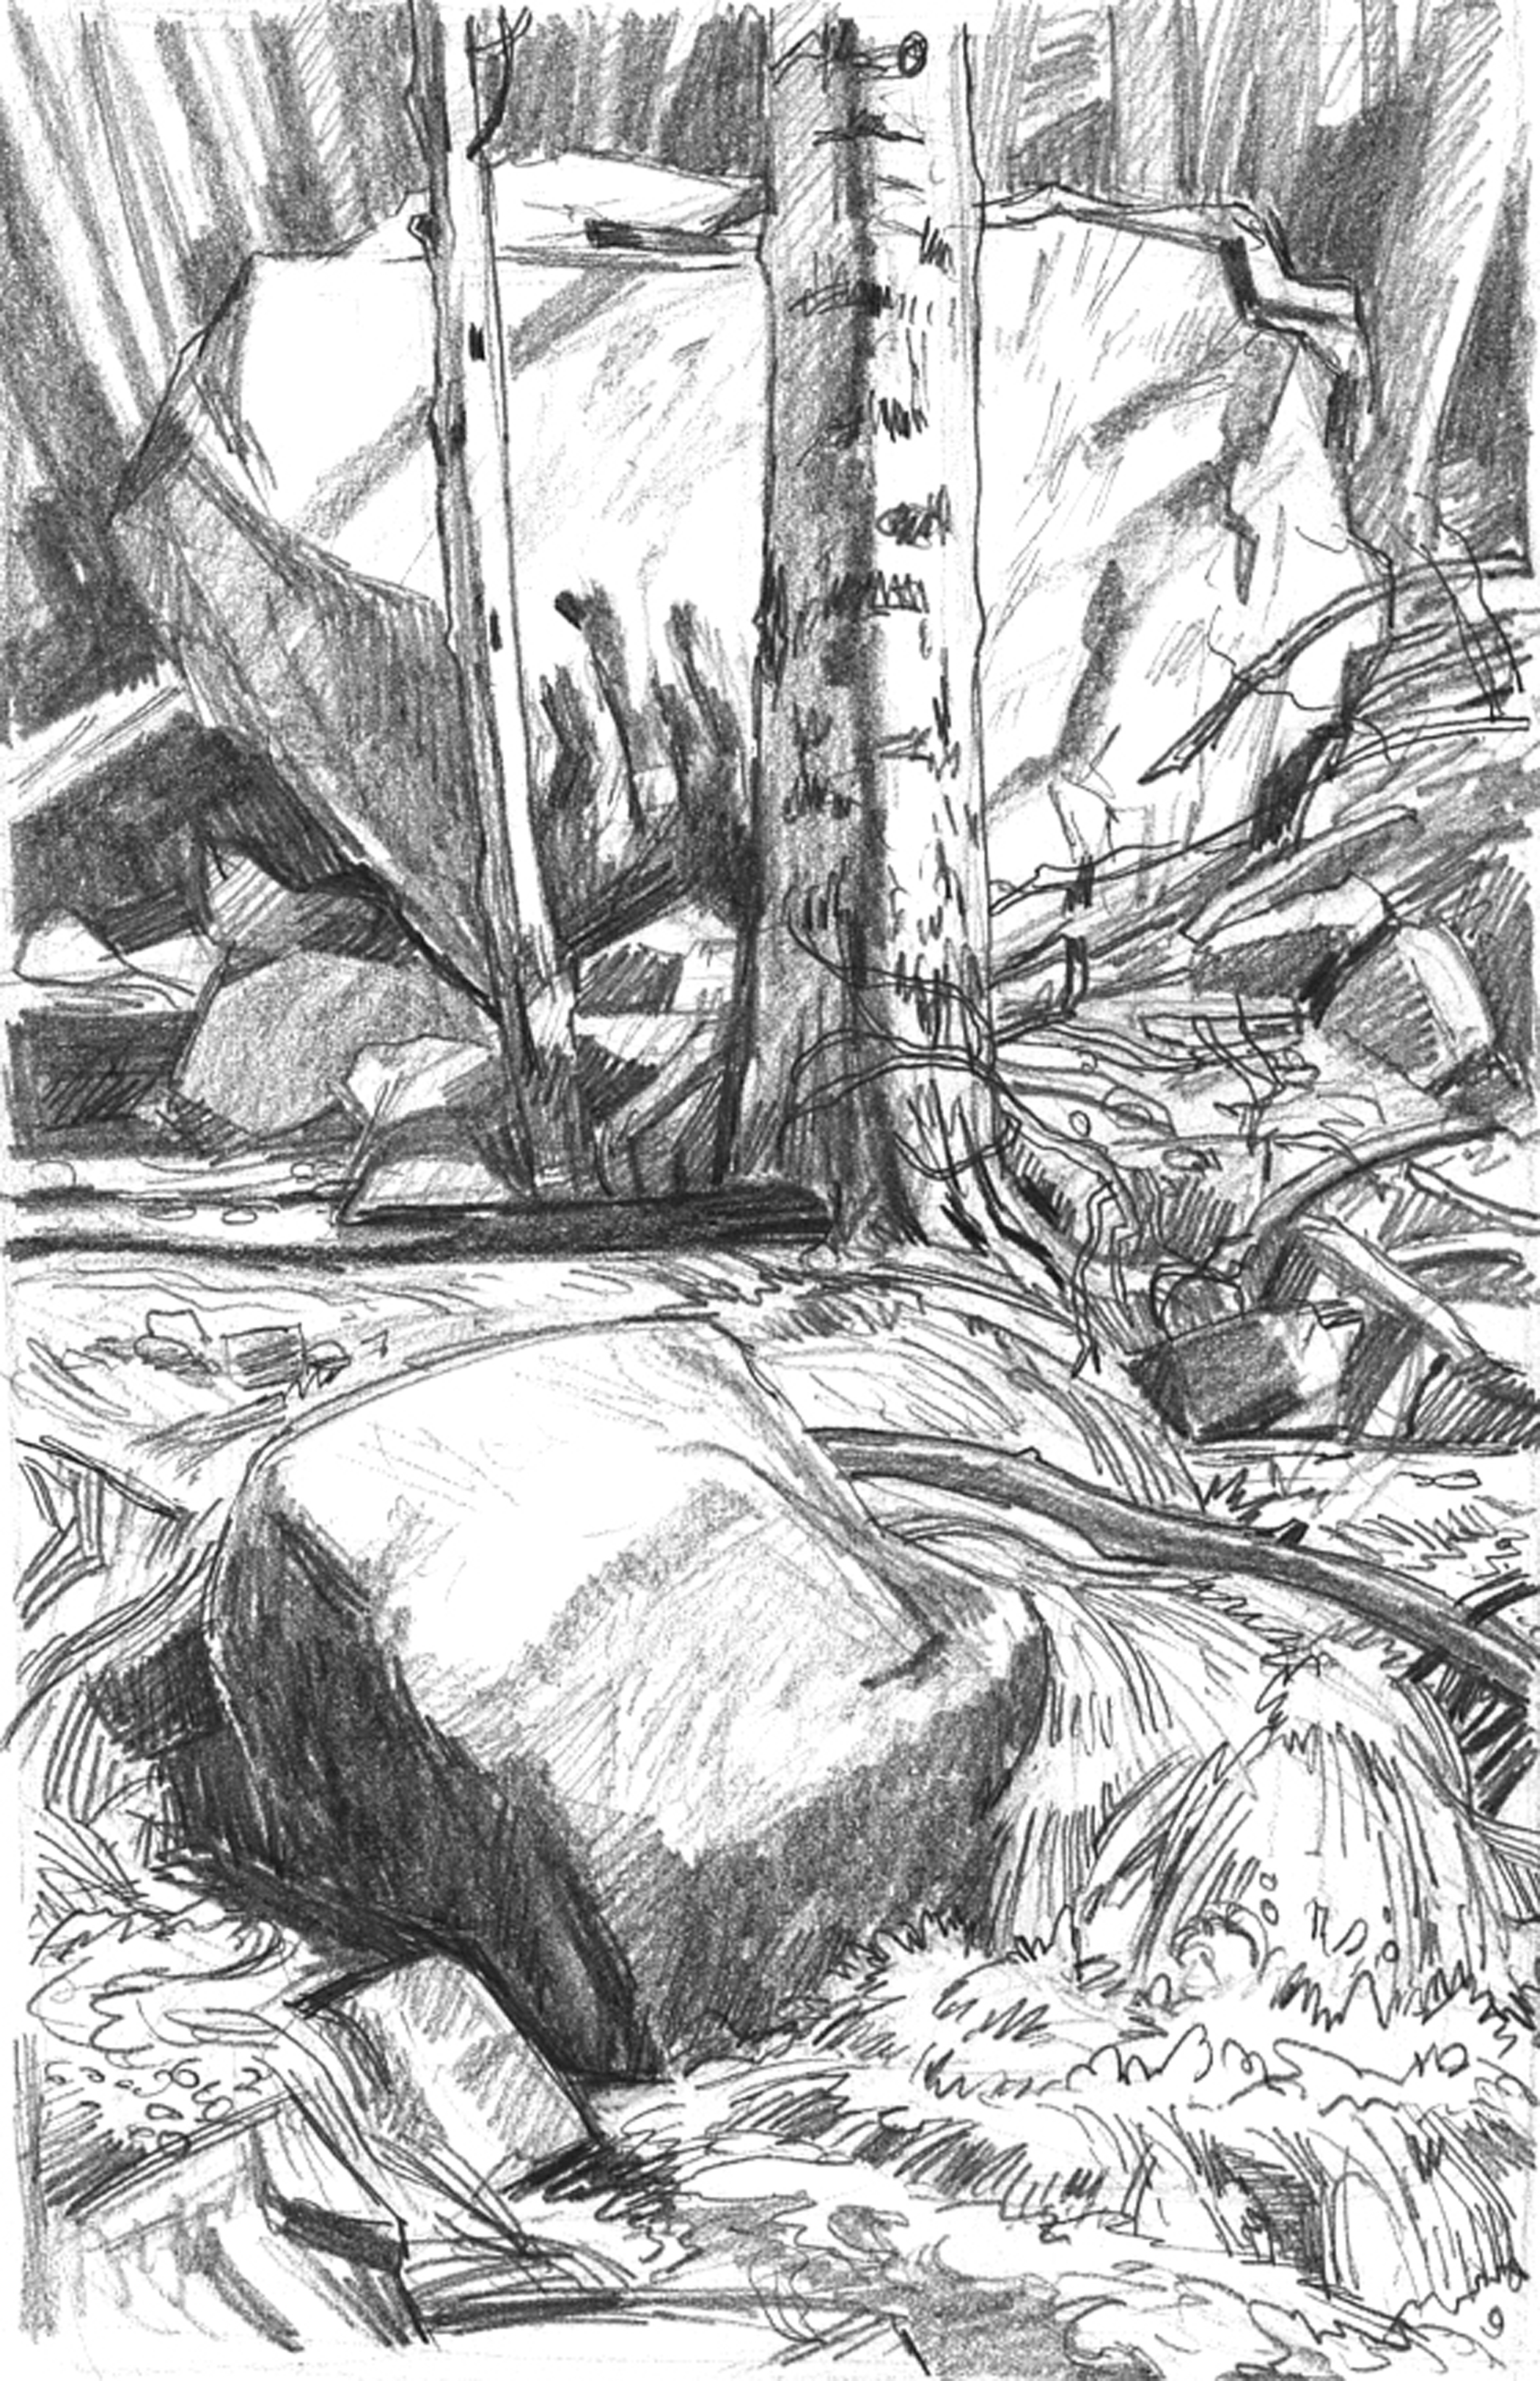 Baldy creek cascades & boulders